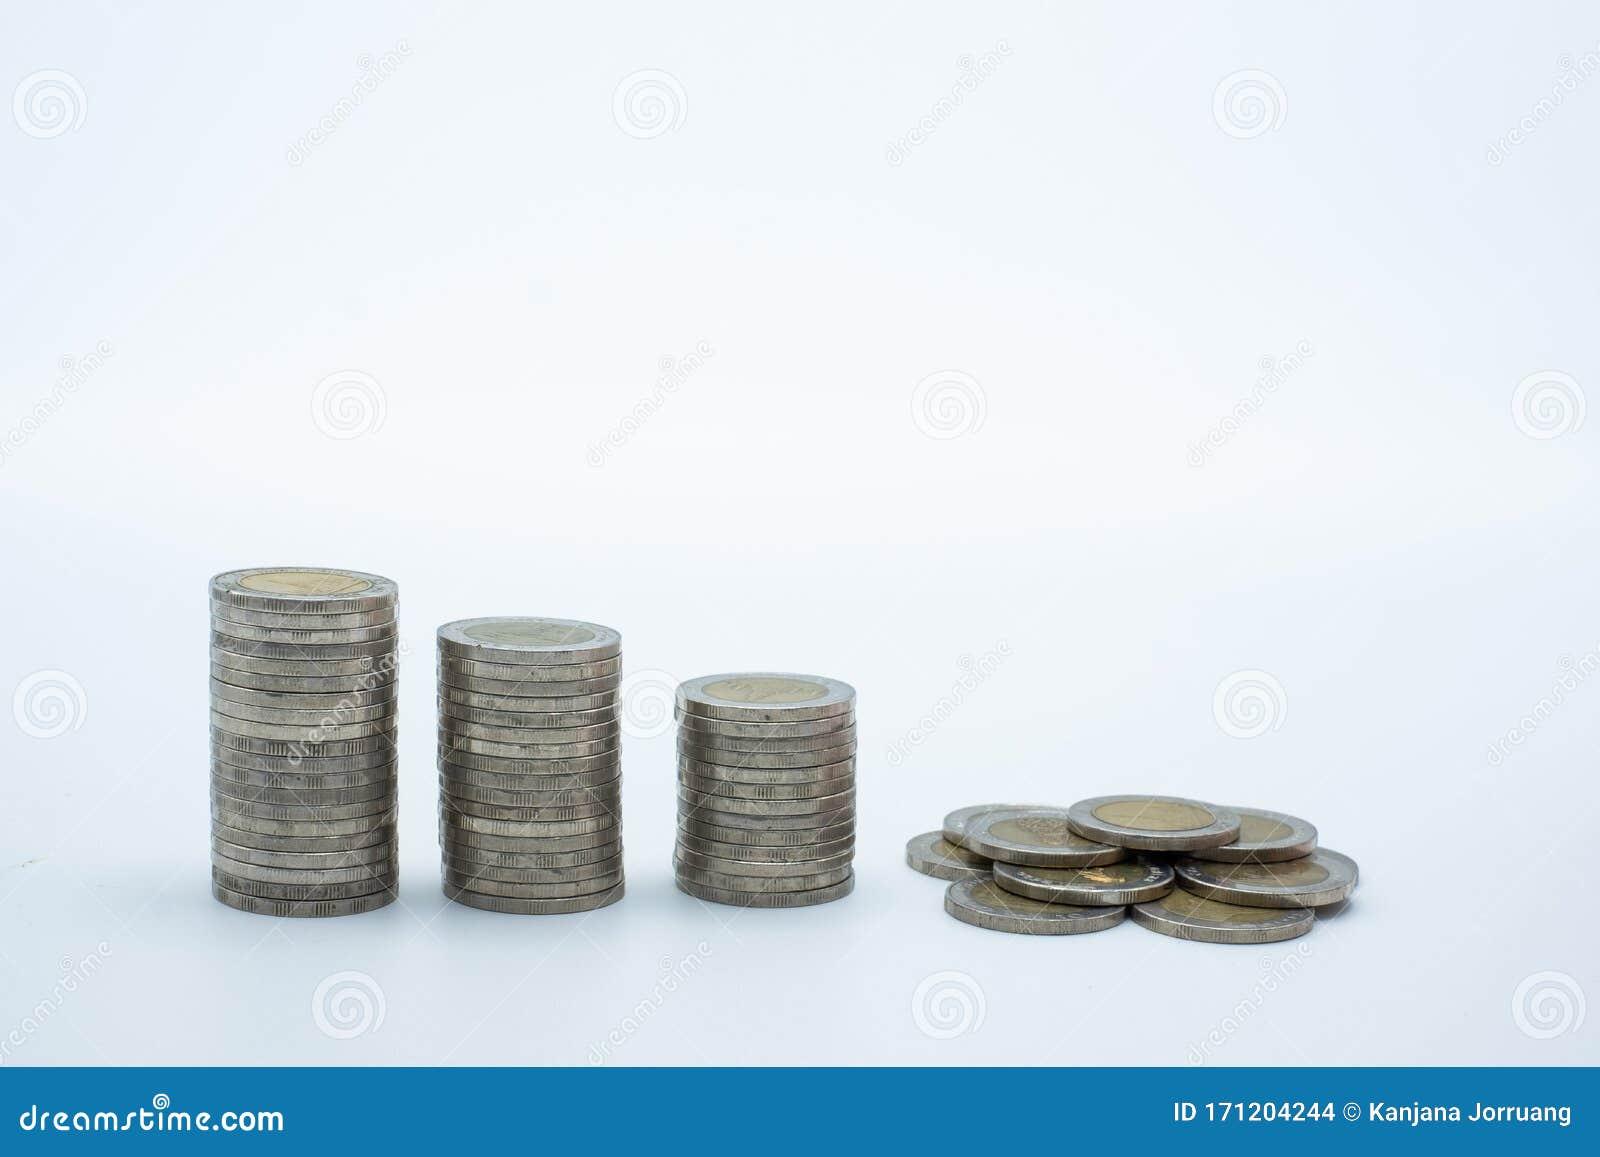 etoro costi e commissioni